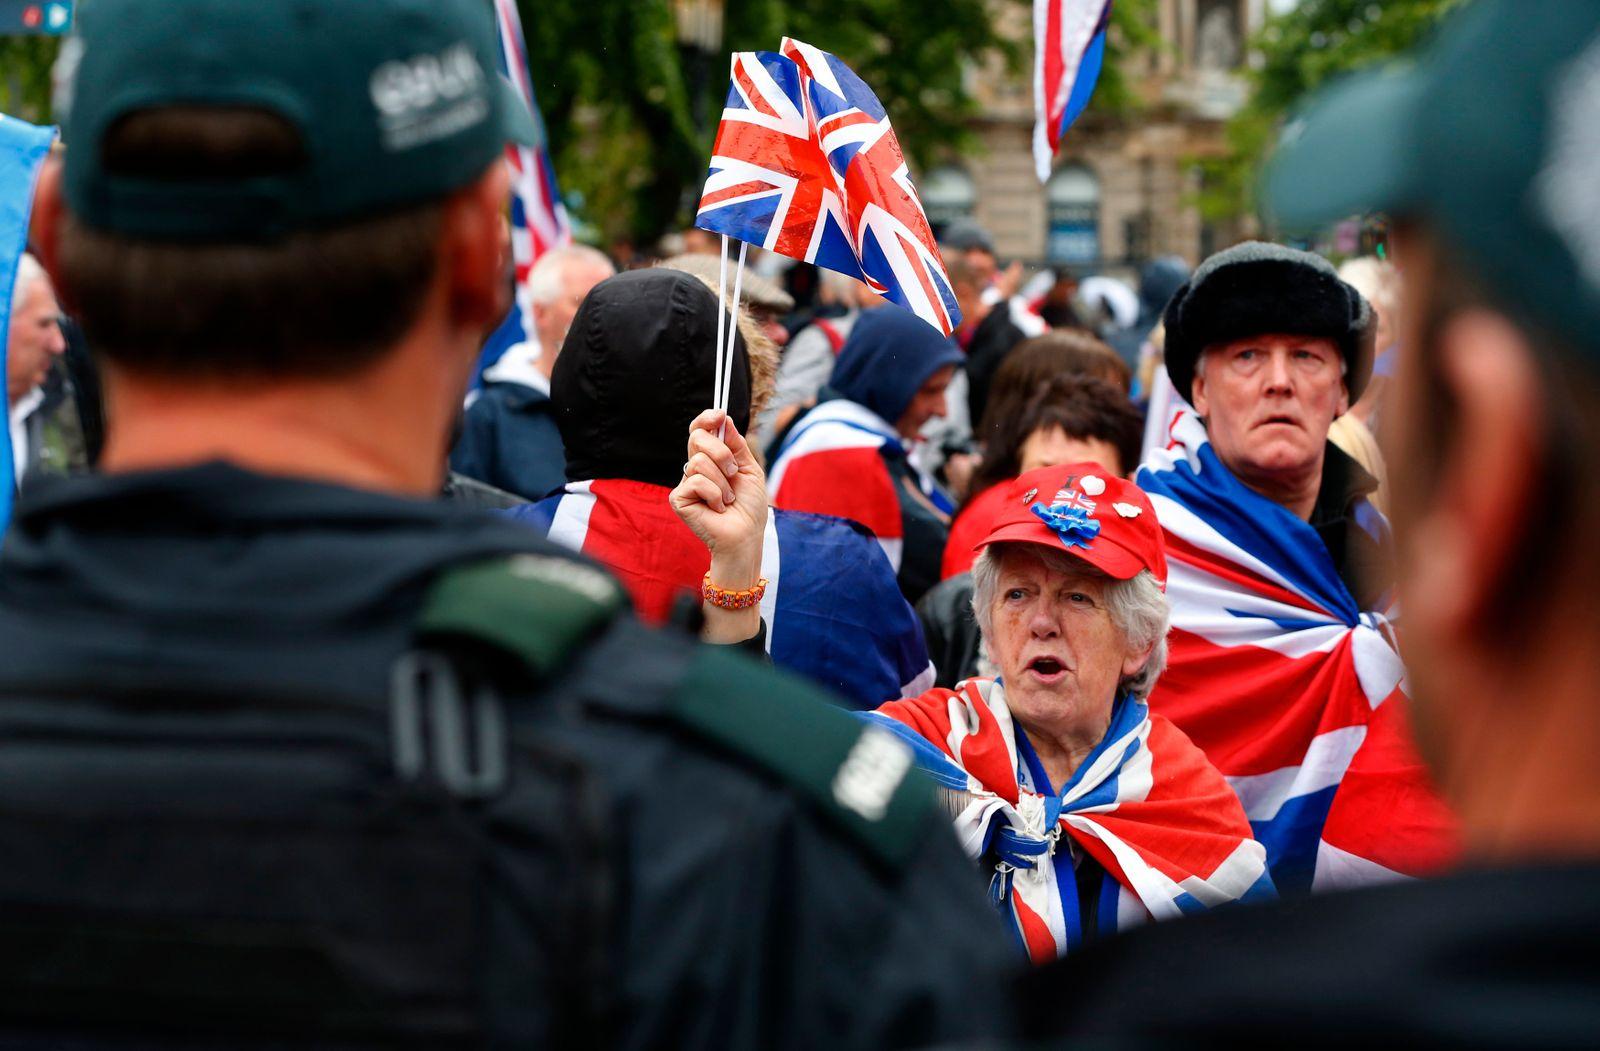 UK-G8-SUMMIT/PROTEST